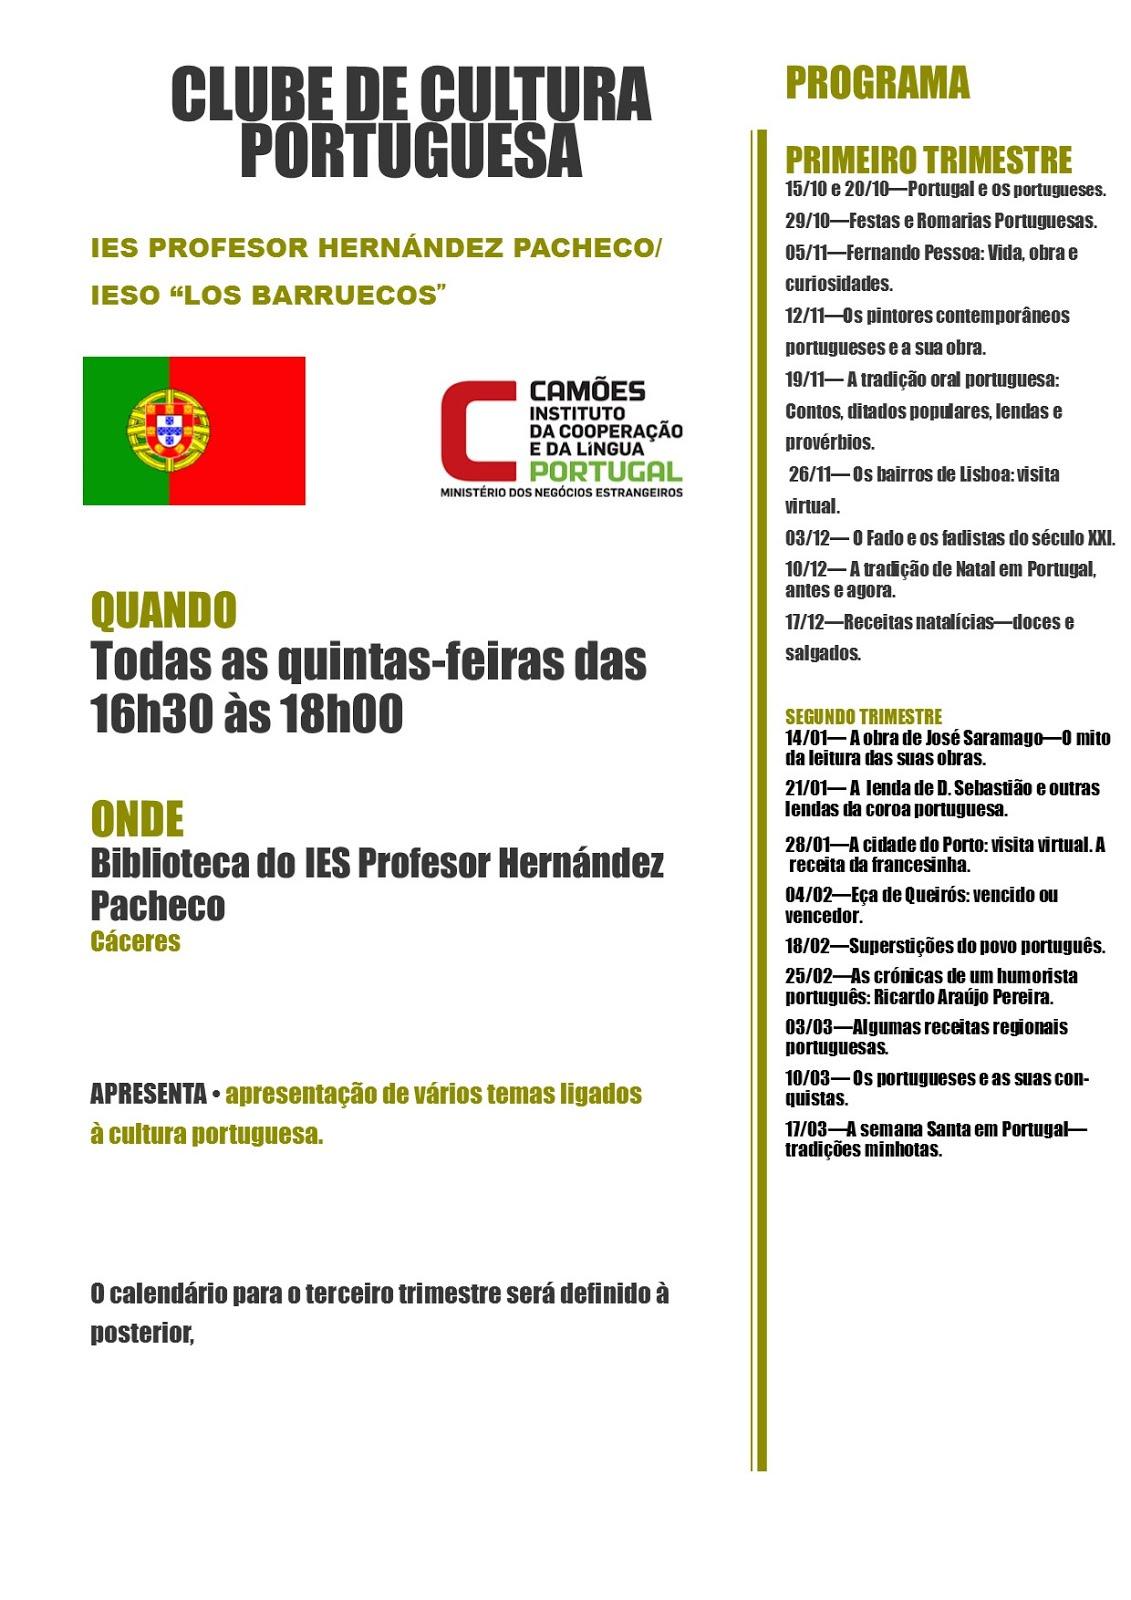 Clube de Cultura Portuguesa